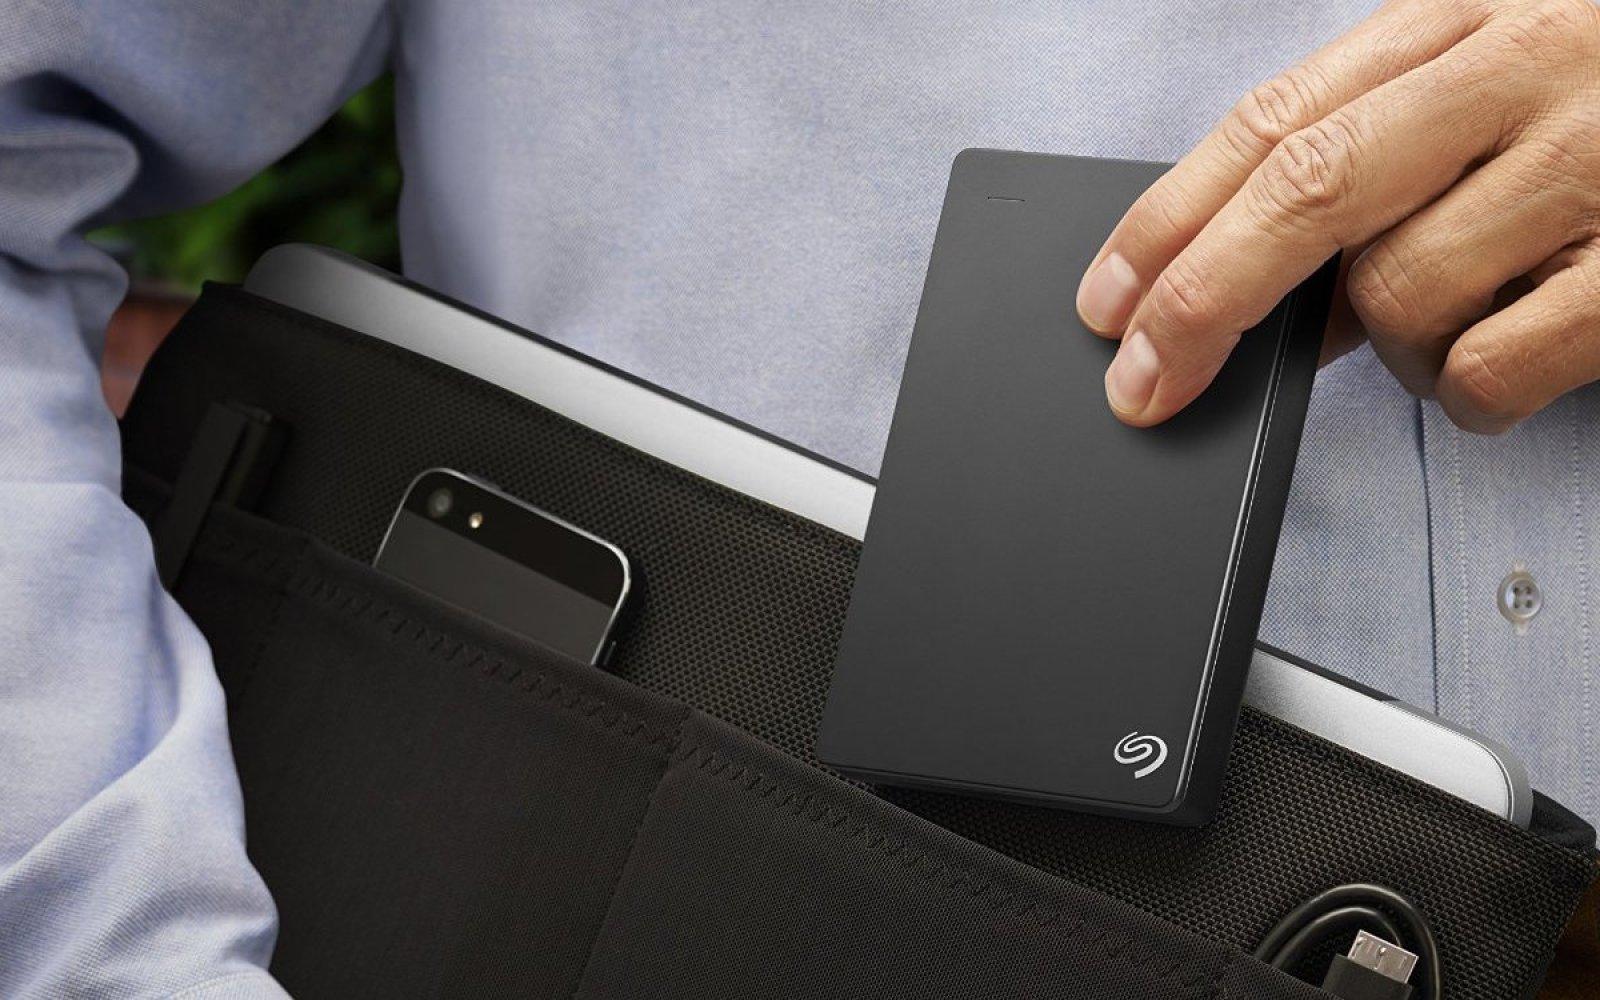 Seagate 4TB Portable, Bus-powered USB 3 Hard Drive w/ 200GB Cloud: $105 shipped